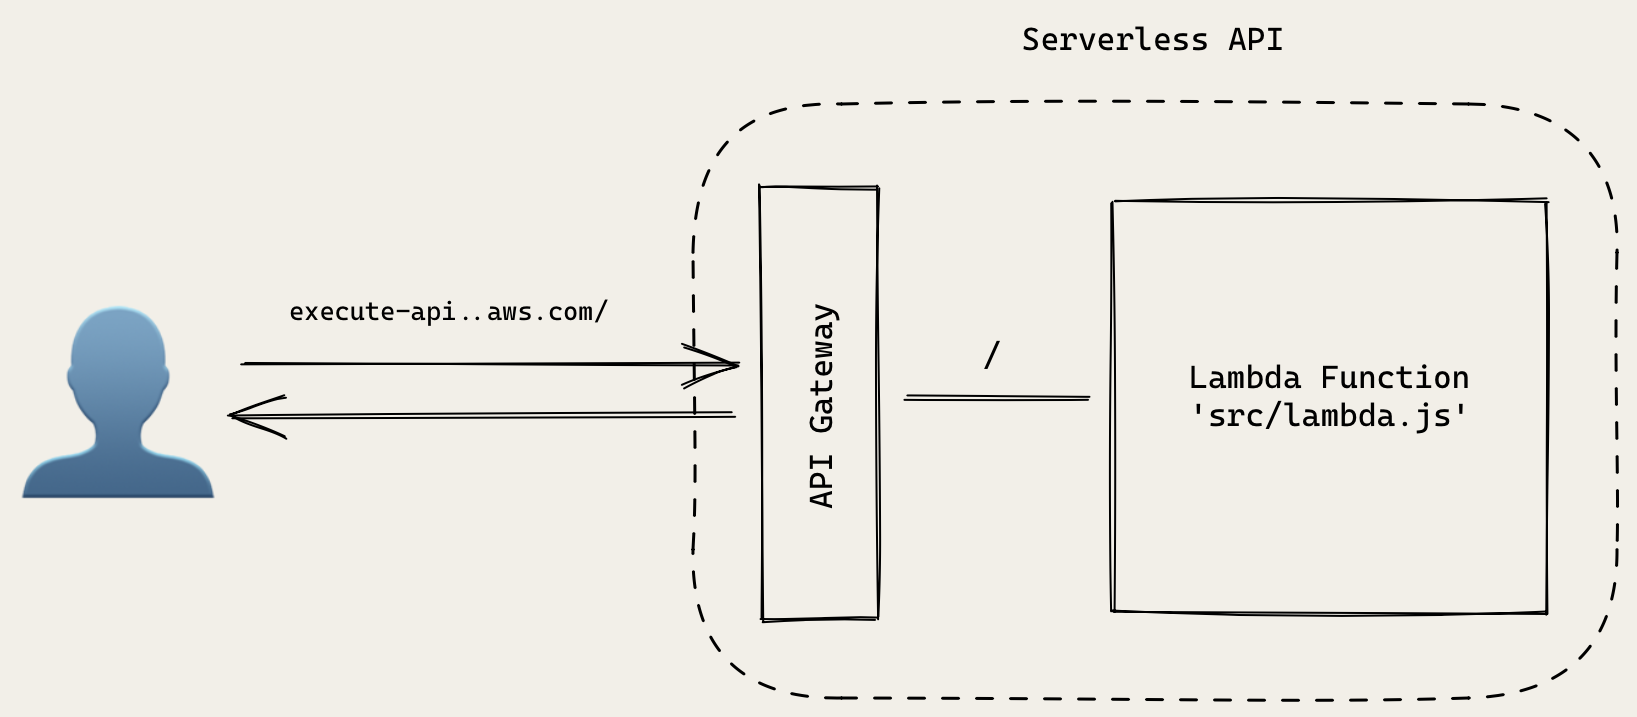 Serverless Hello World API architecture